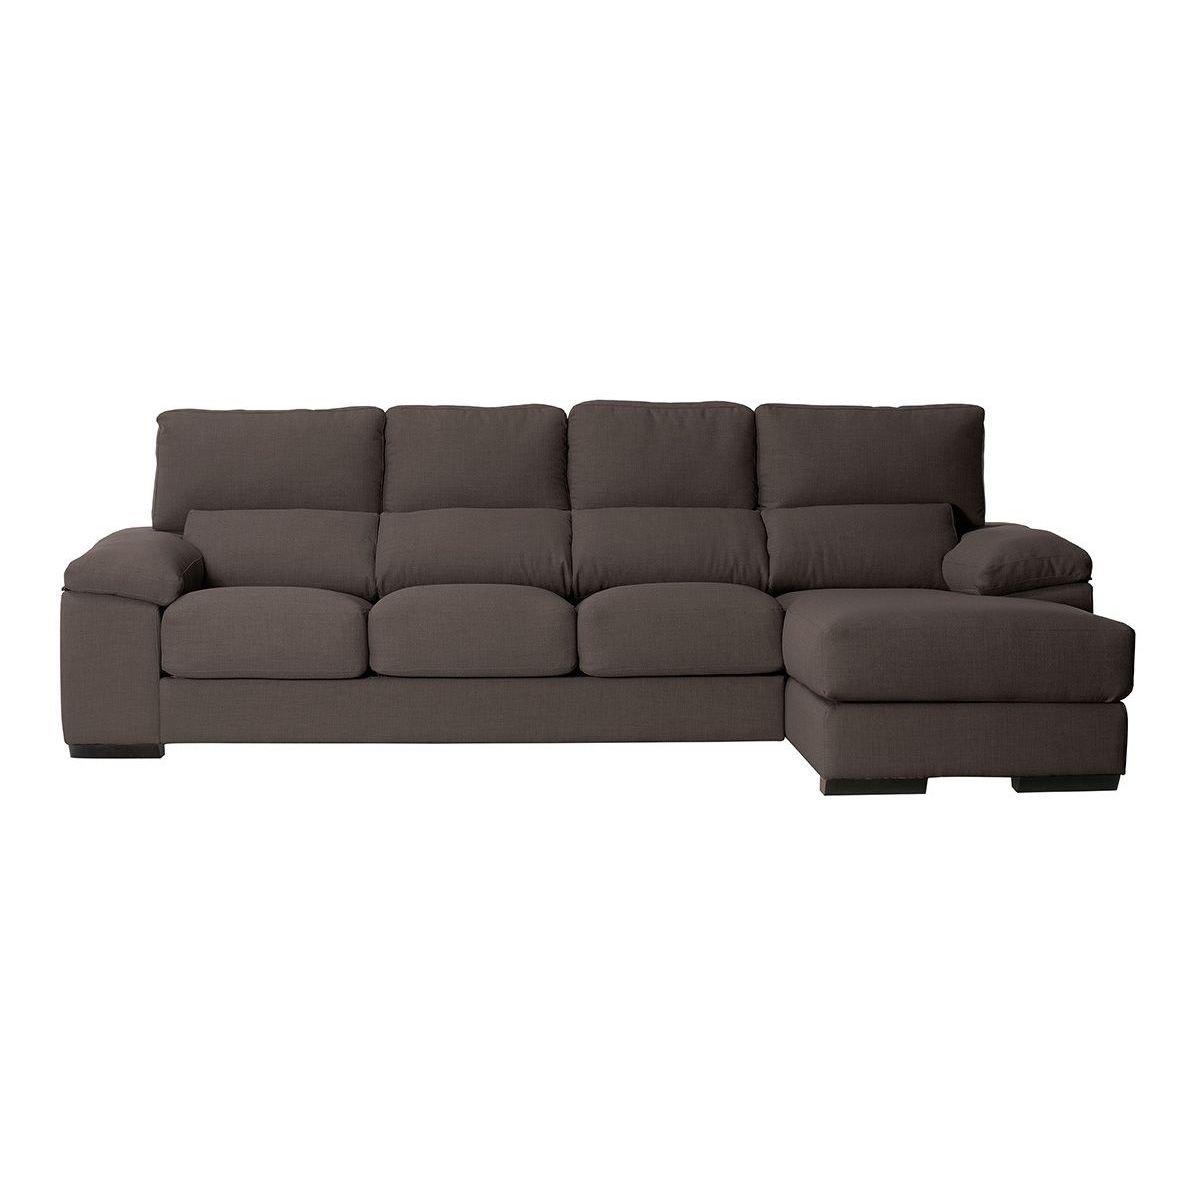 Chaise Sofa Longue Electrico